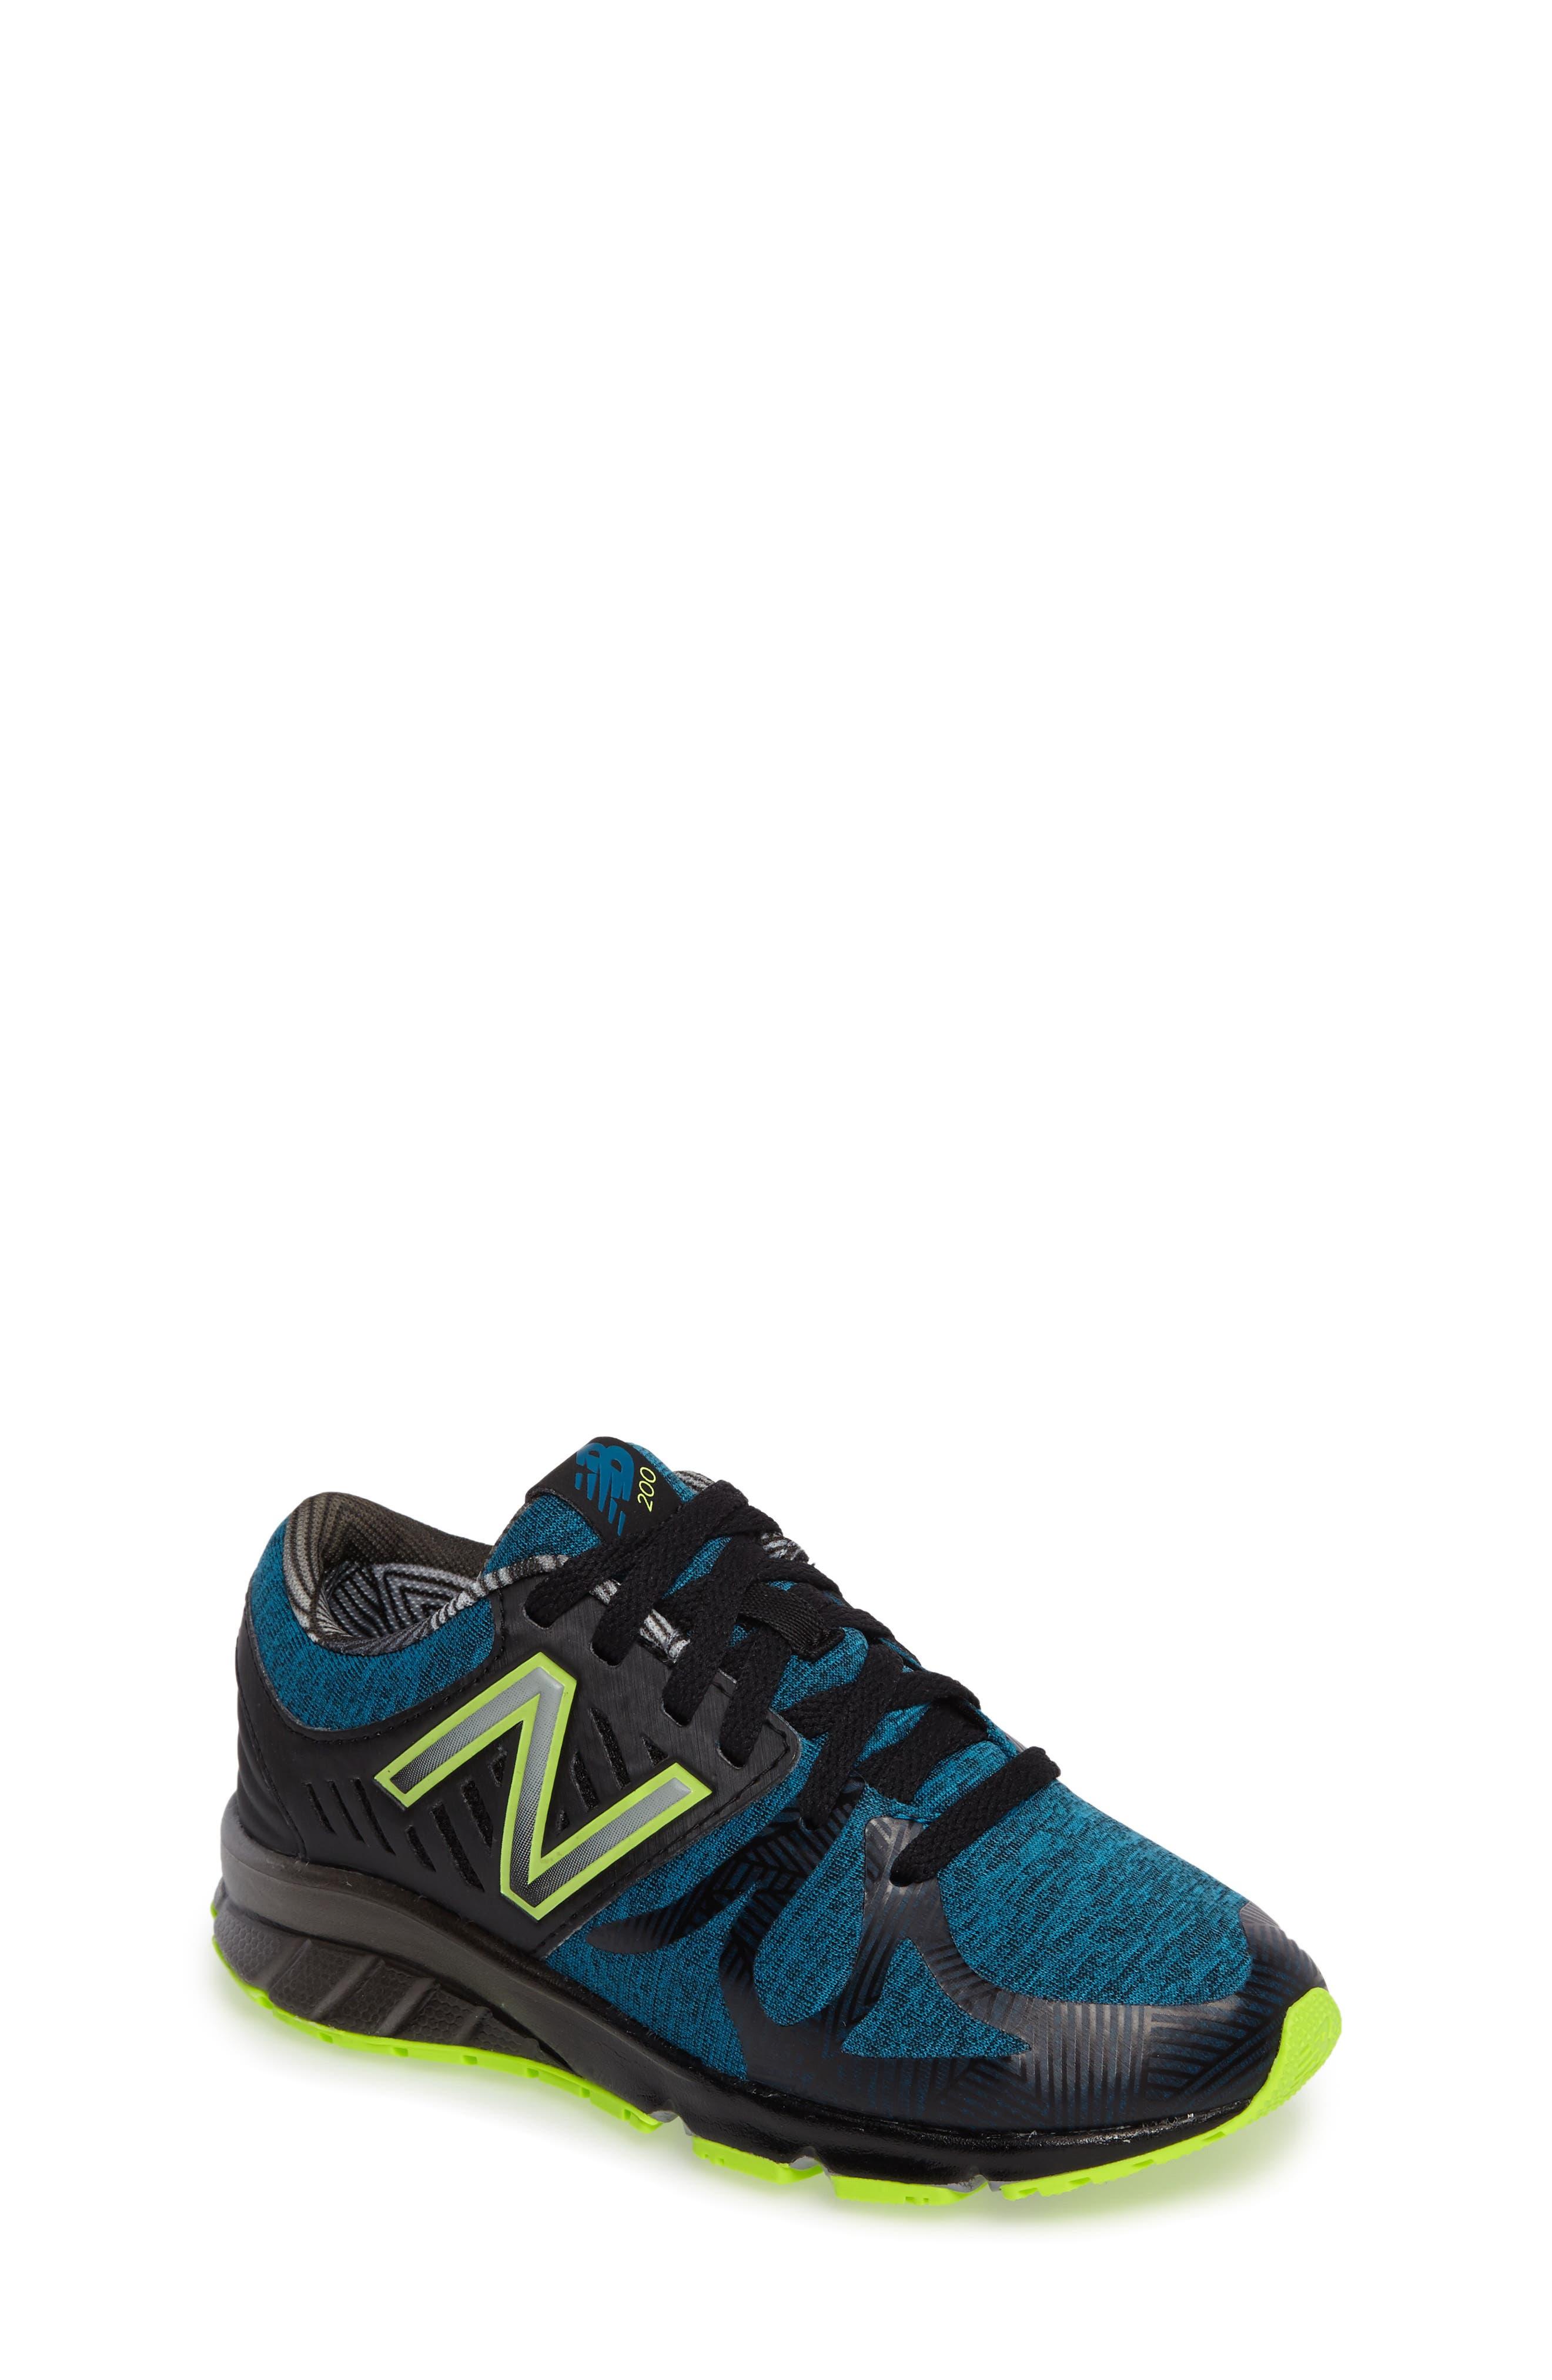 200 Electric Rainbow Athletic Shoe,                             Main thumbnail 1, color,                             407